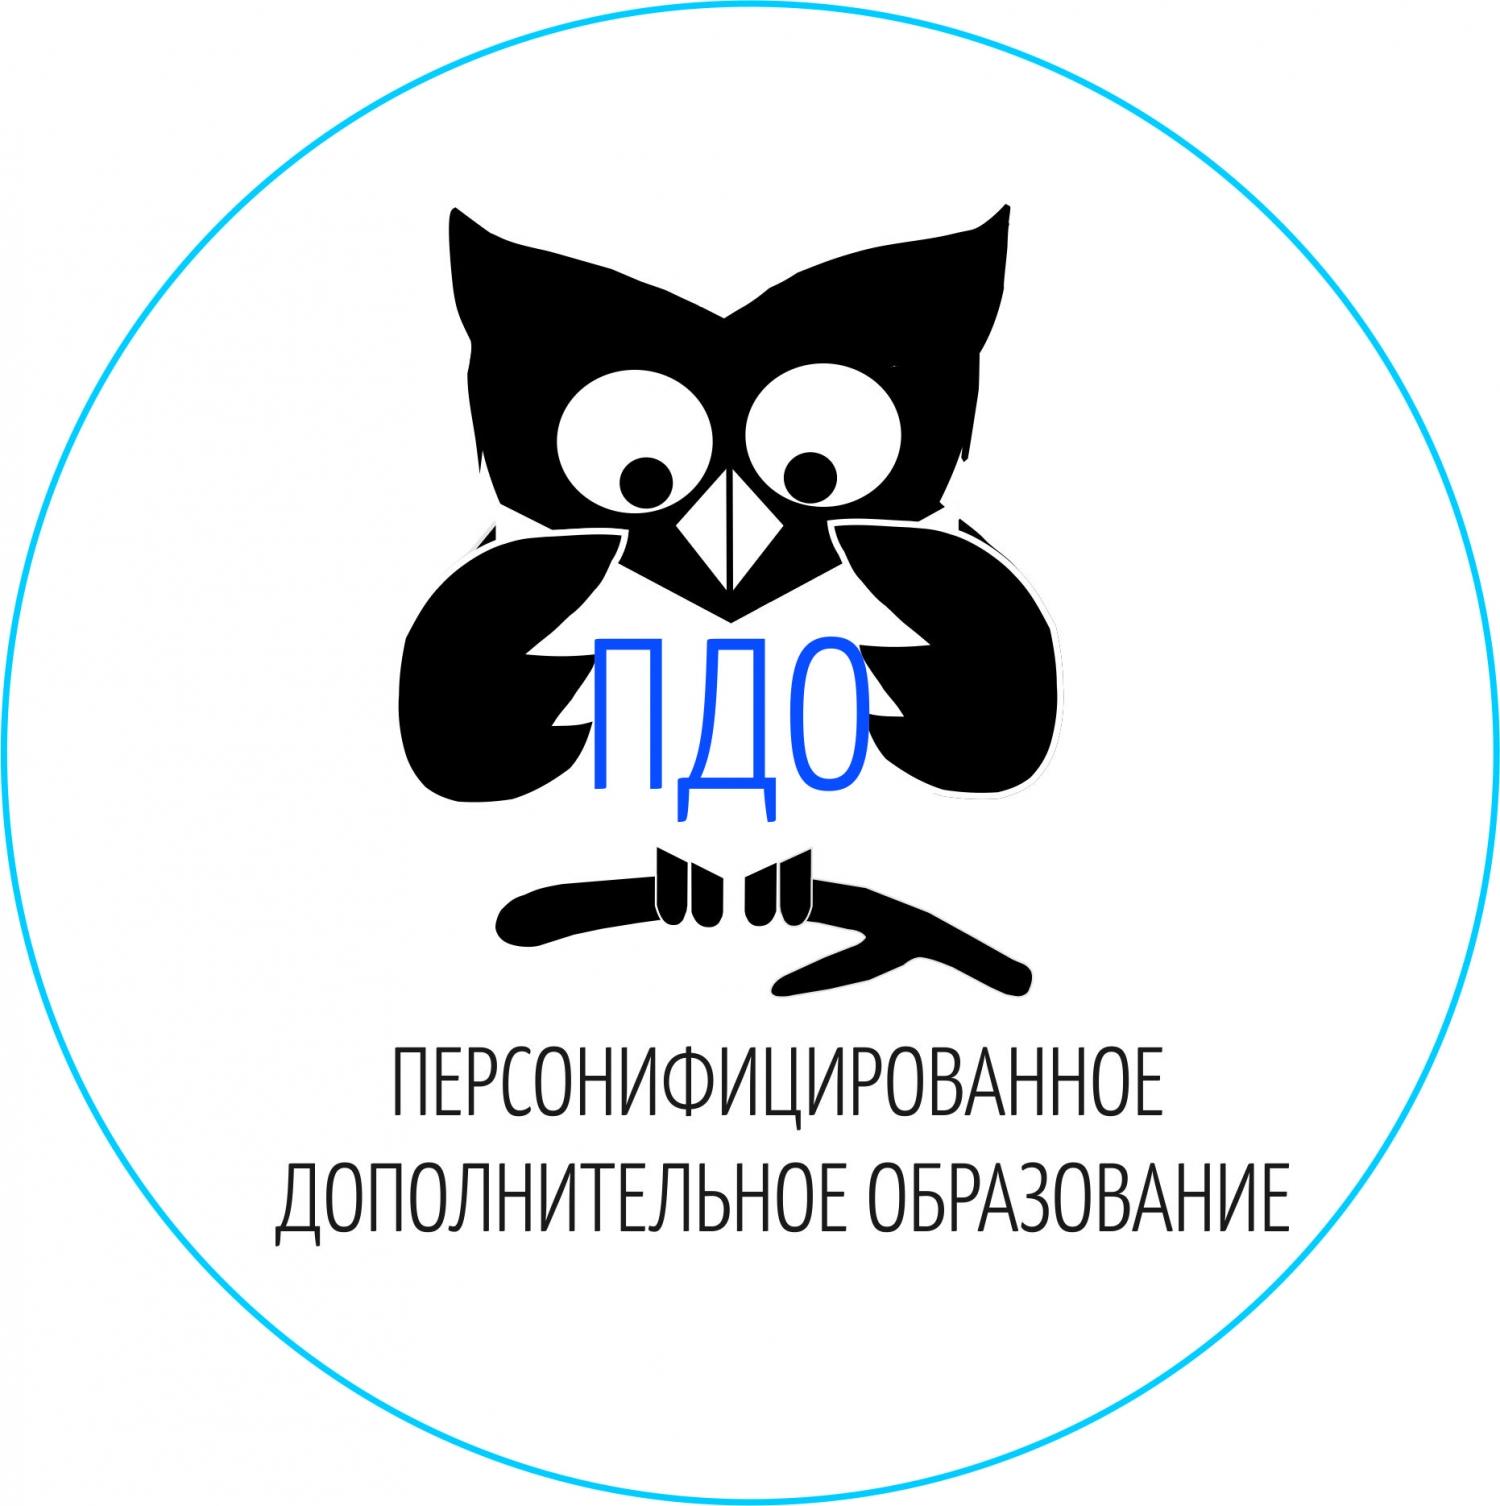 Логотип для интернет-портала фото f_8055a5c4d0c5752f.jpg